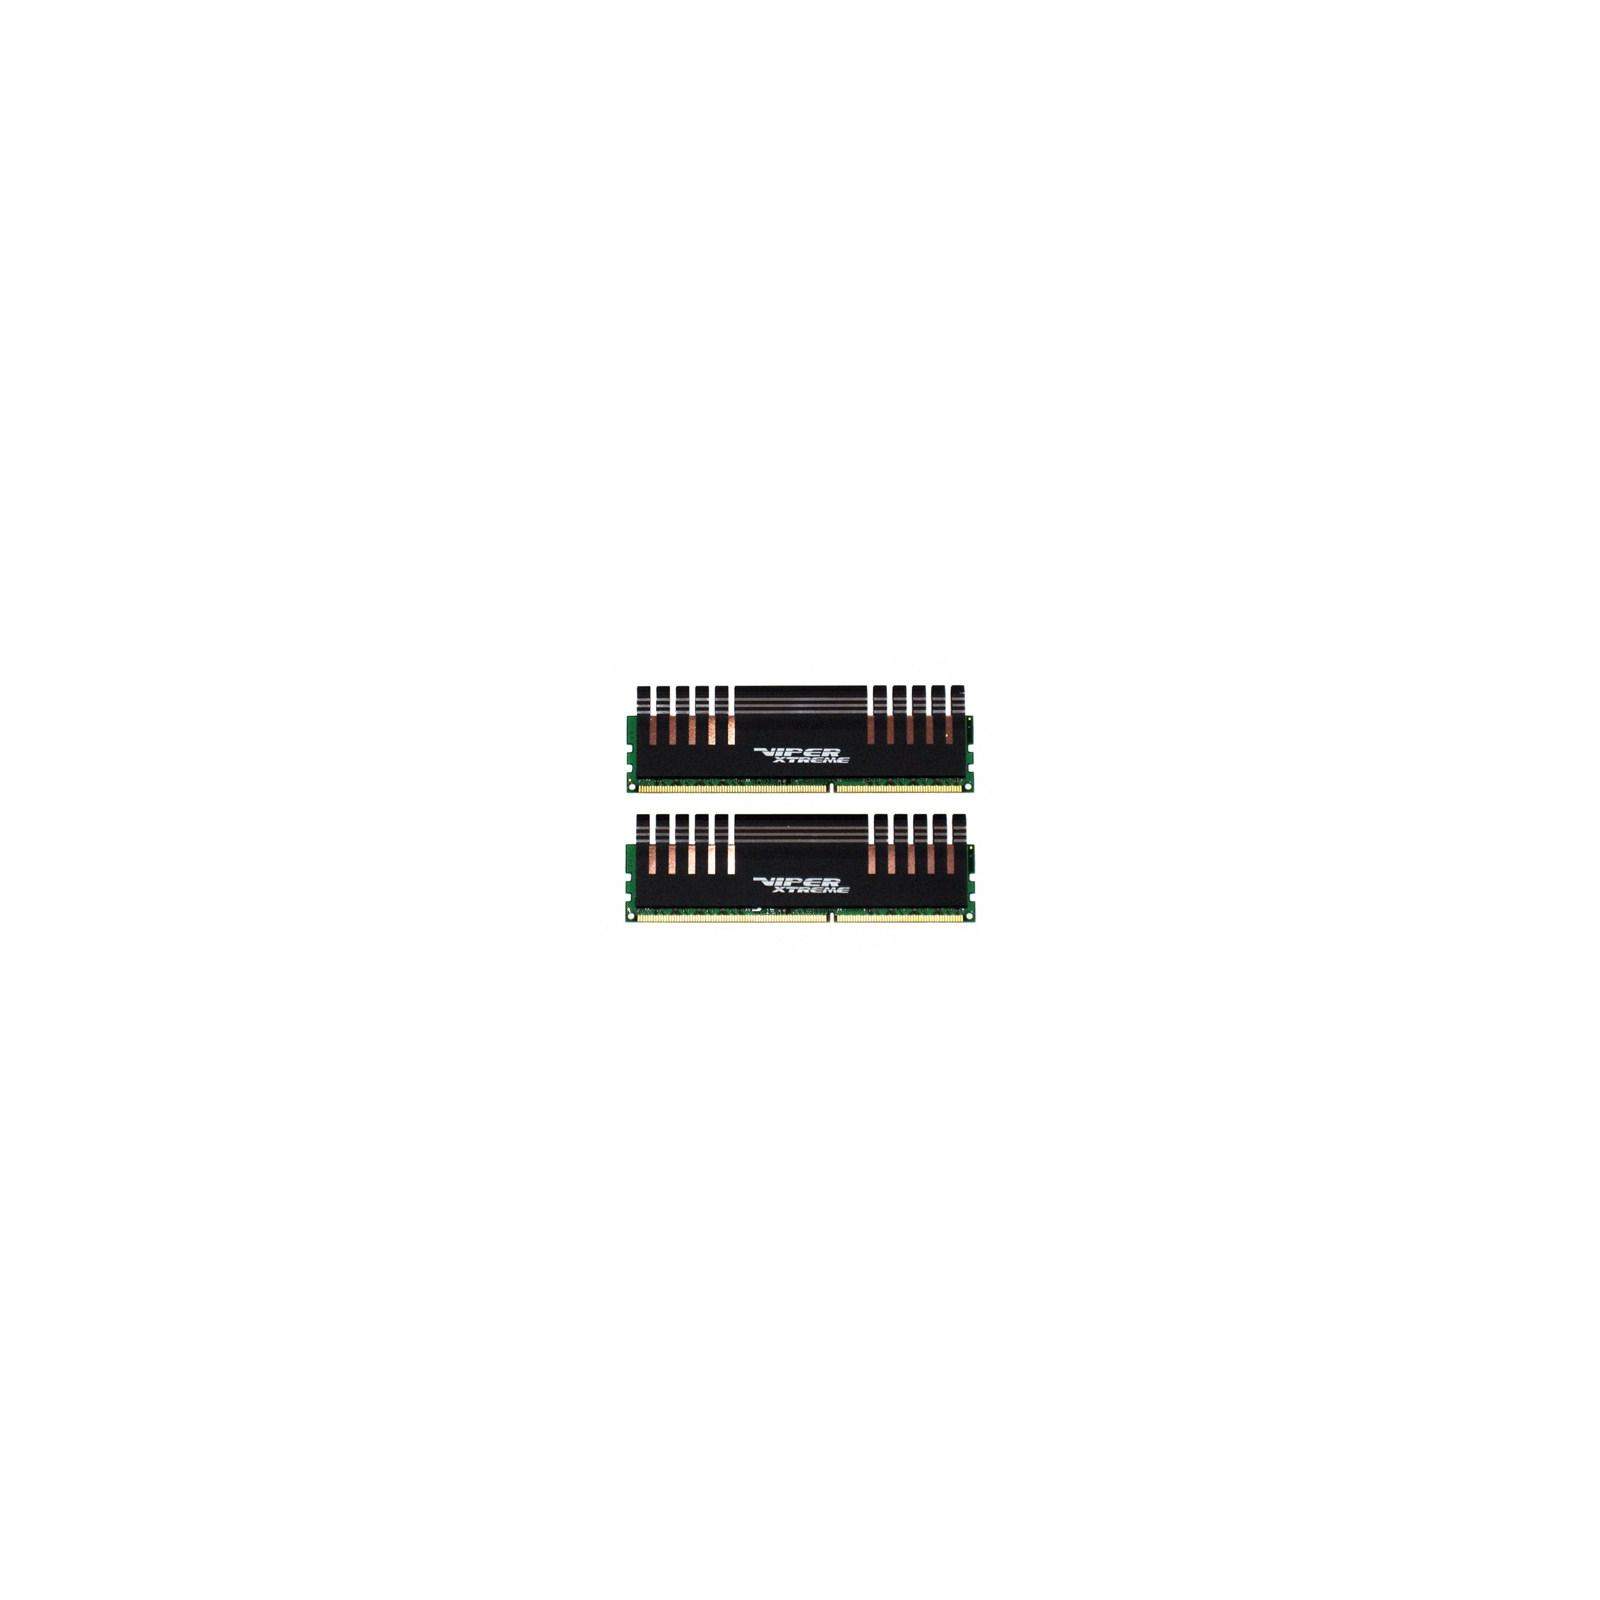 Модуль памяти для компьютера DDR3 8GB (2x4GB) 1600 MHz Patriot (PXD38G1600LLK)